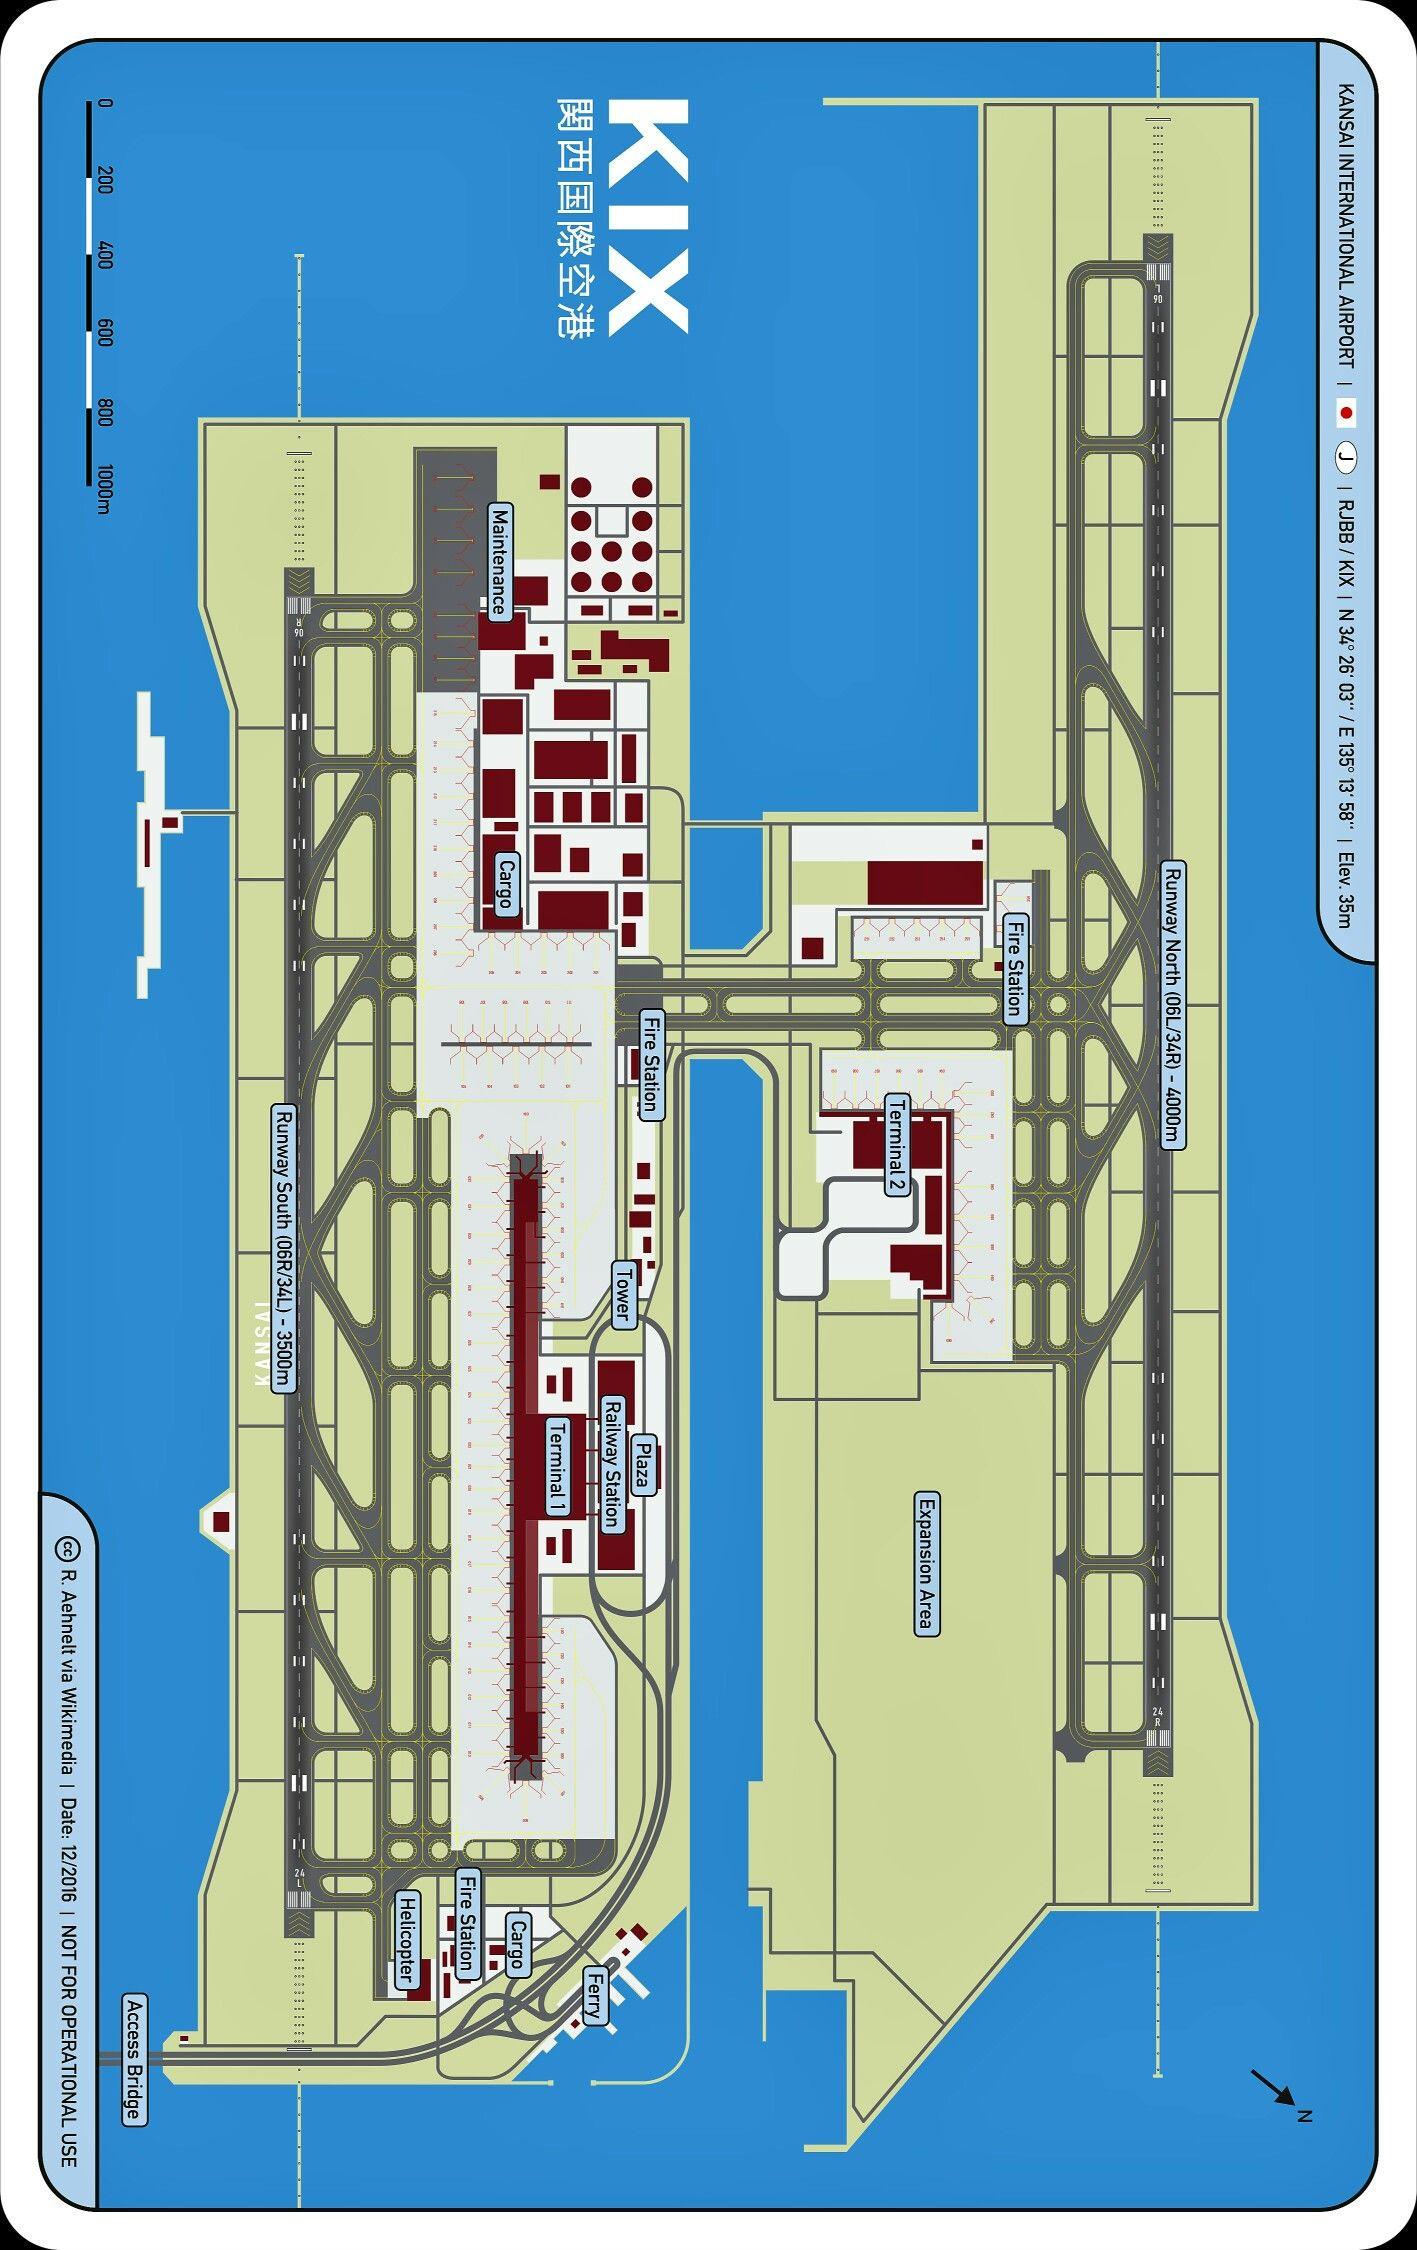 Pin On Airports مطارات